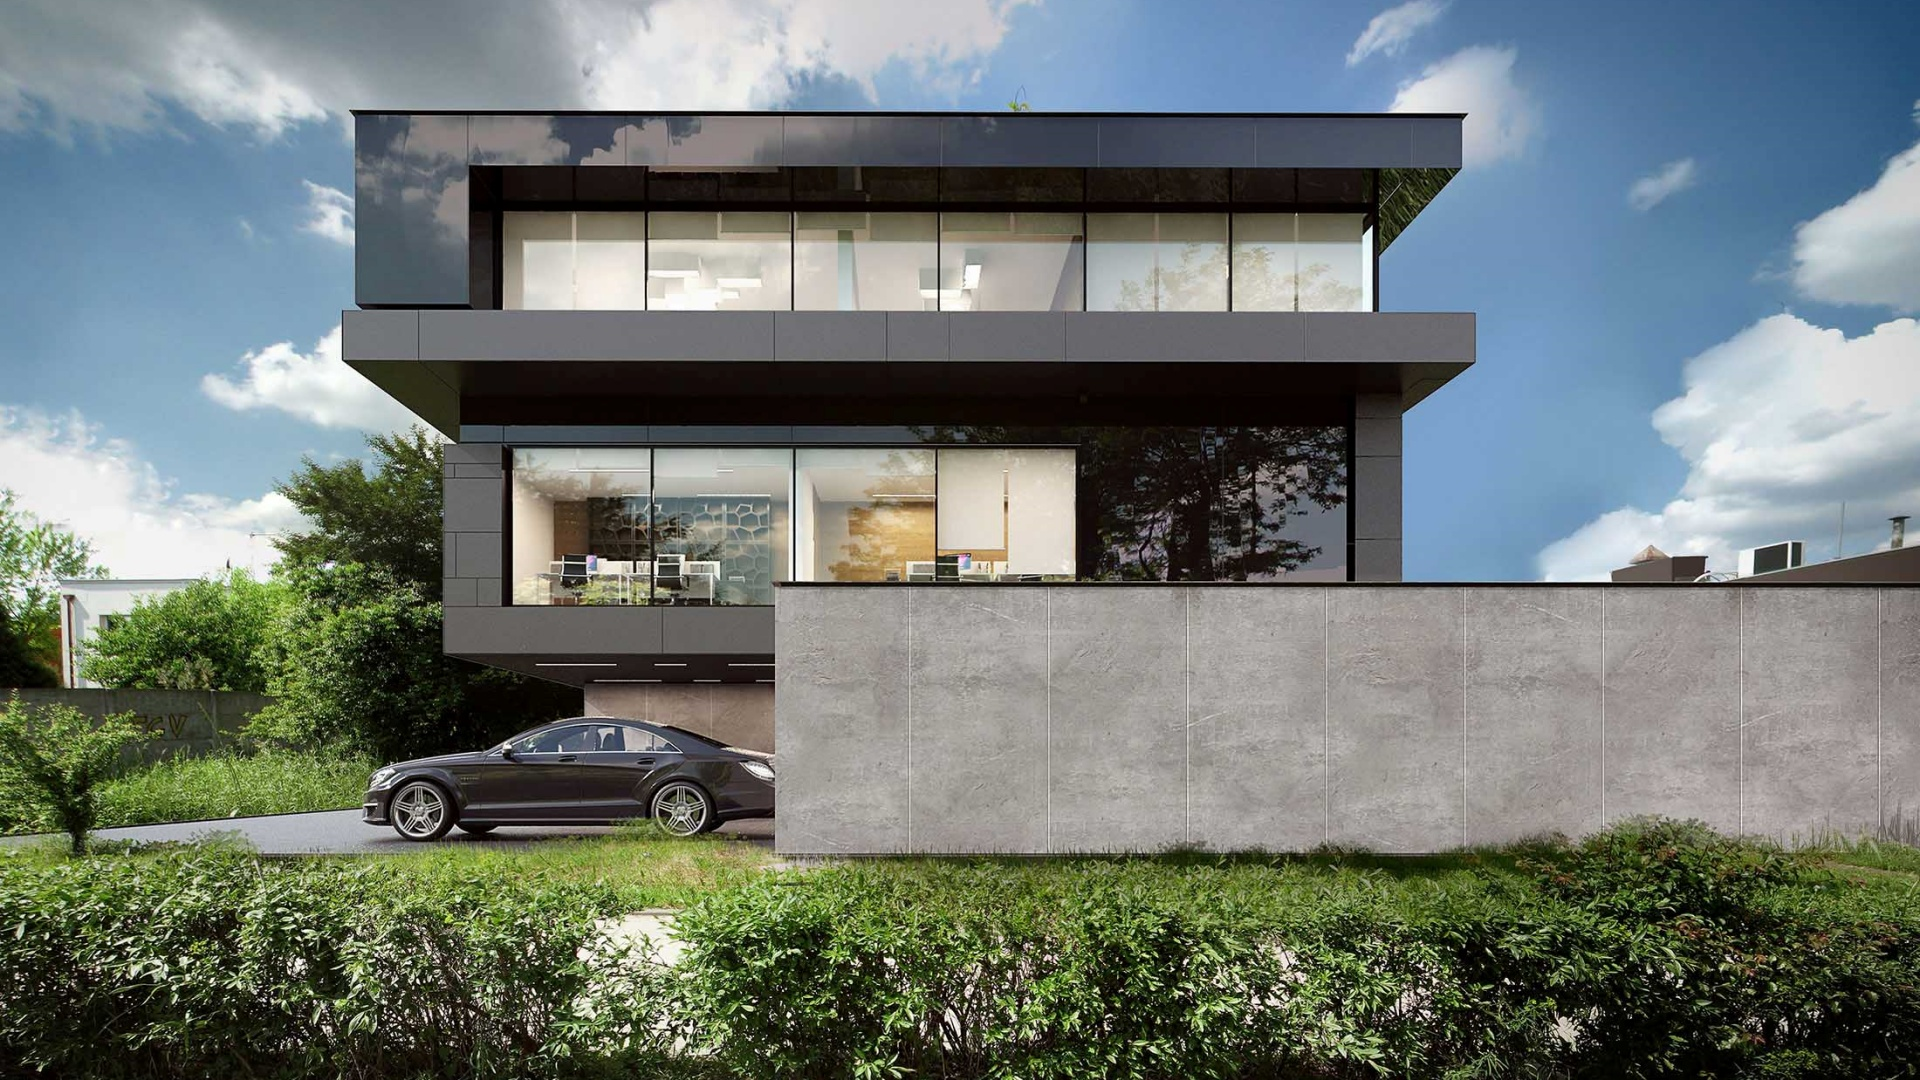 RE: INSENSE BUILDING projektu architekta Marcina Tomaszewskiego REFORM Architekt